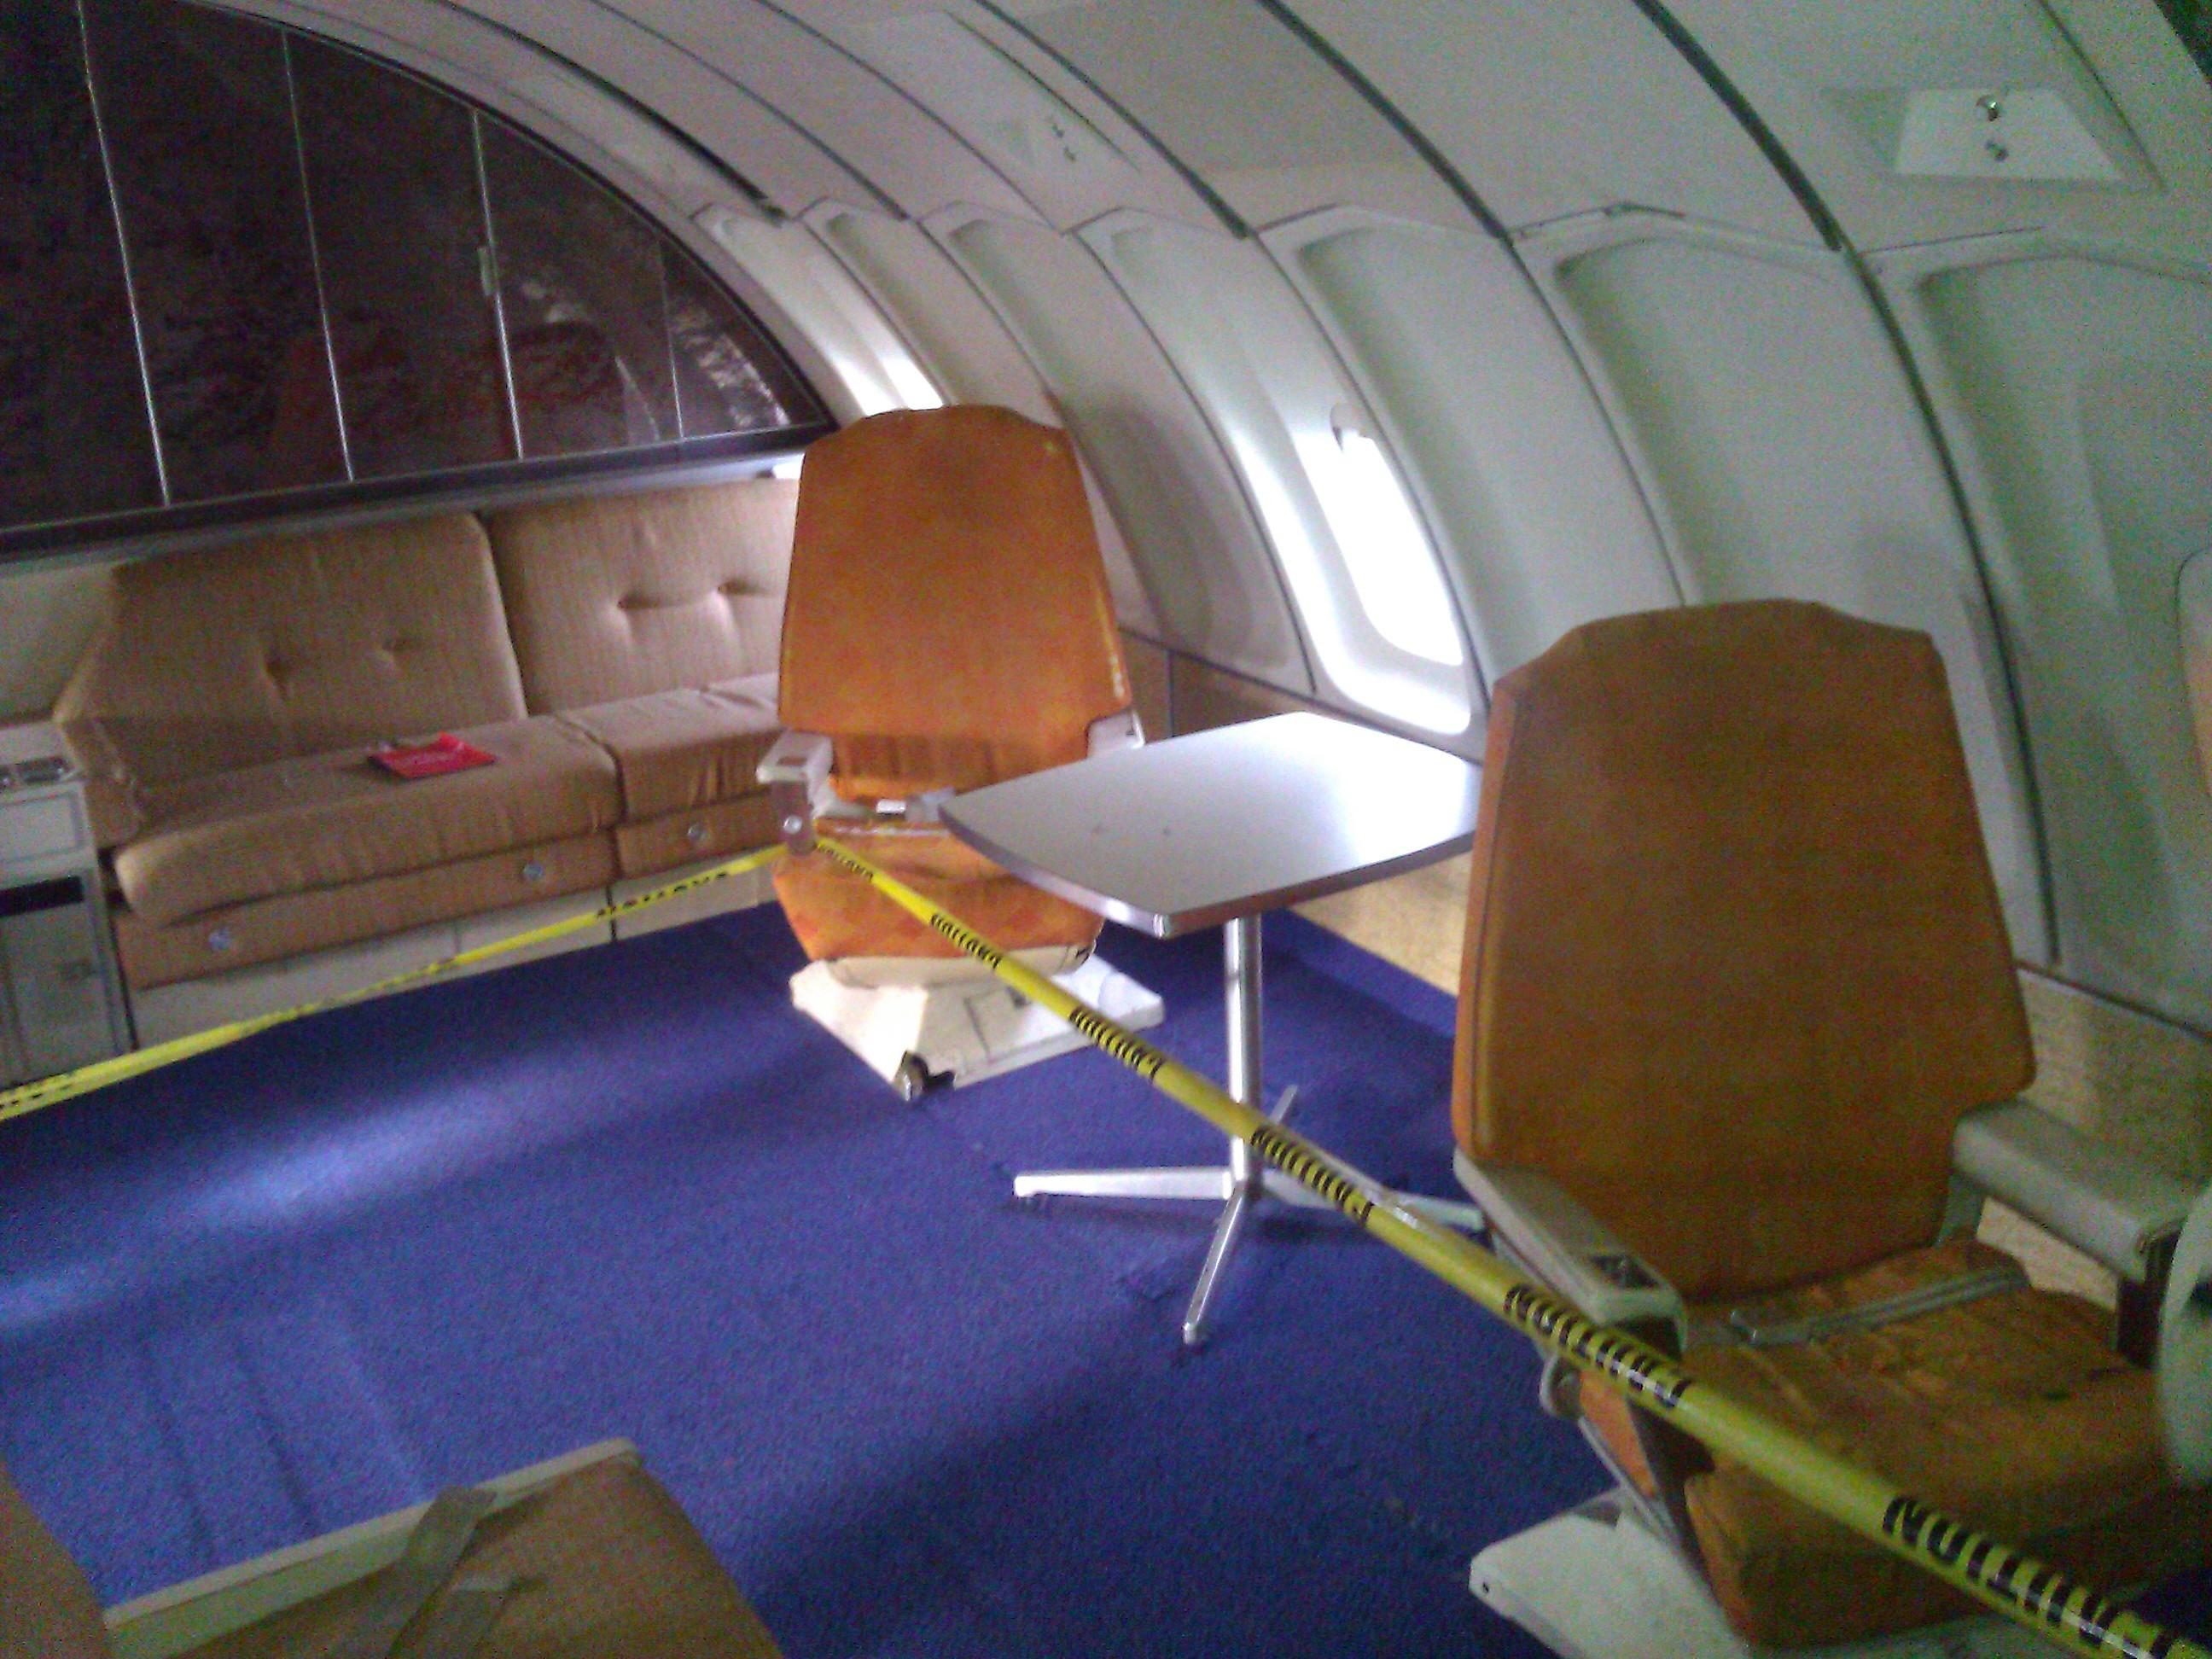 File:Interior of Boeing 747 (N7470).jpg - Wikimedia Commons